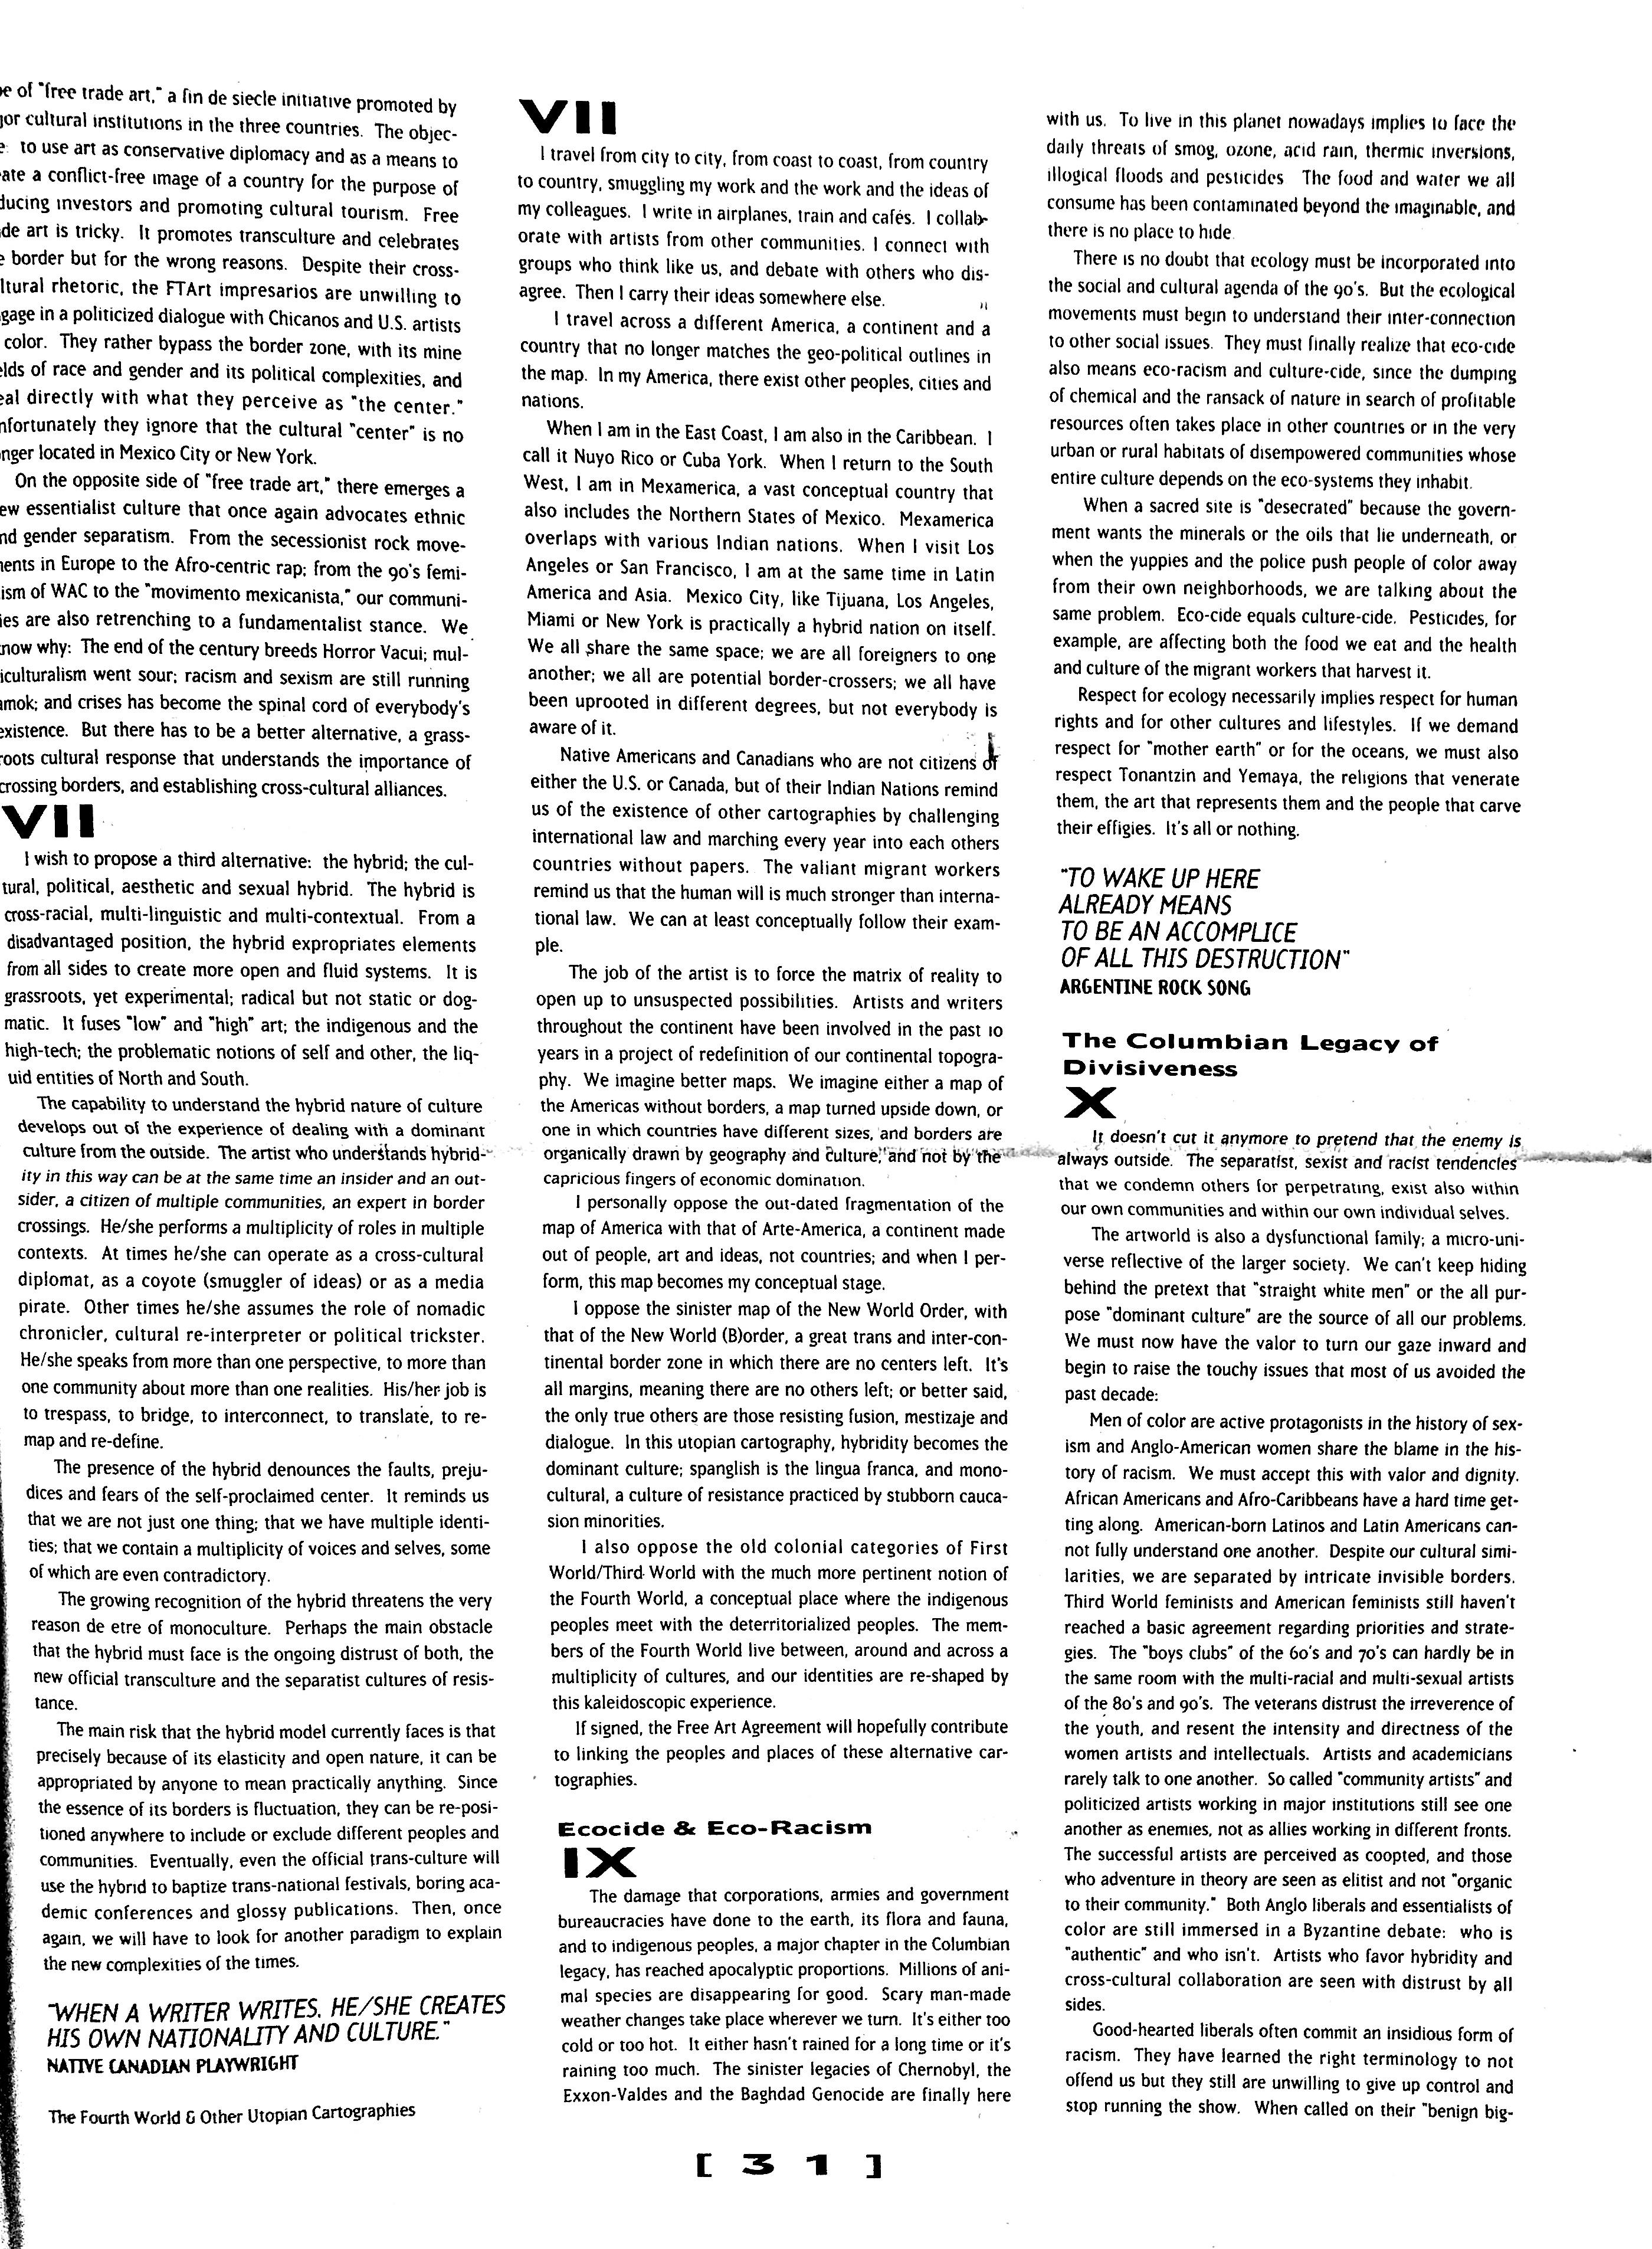 April 1993 - NAAO Bulletin Page 31.jpg